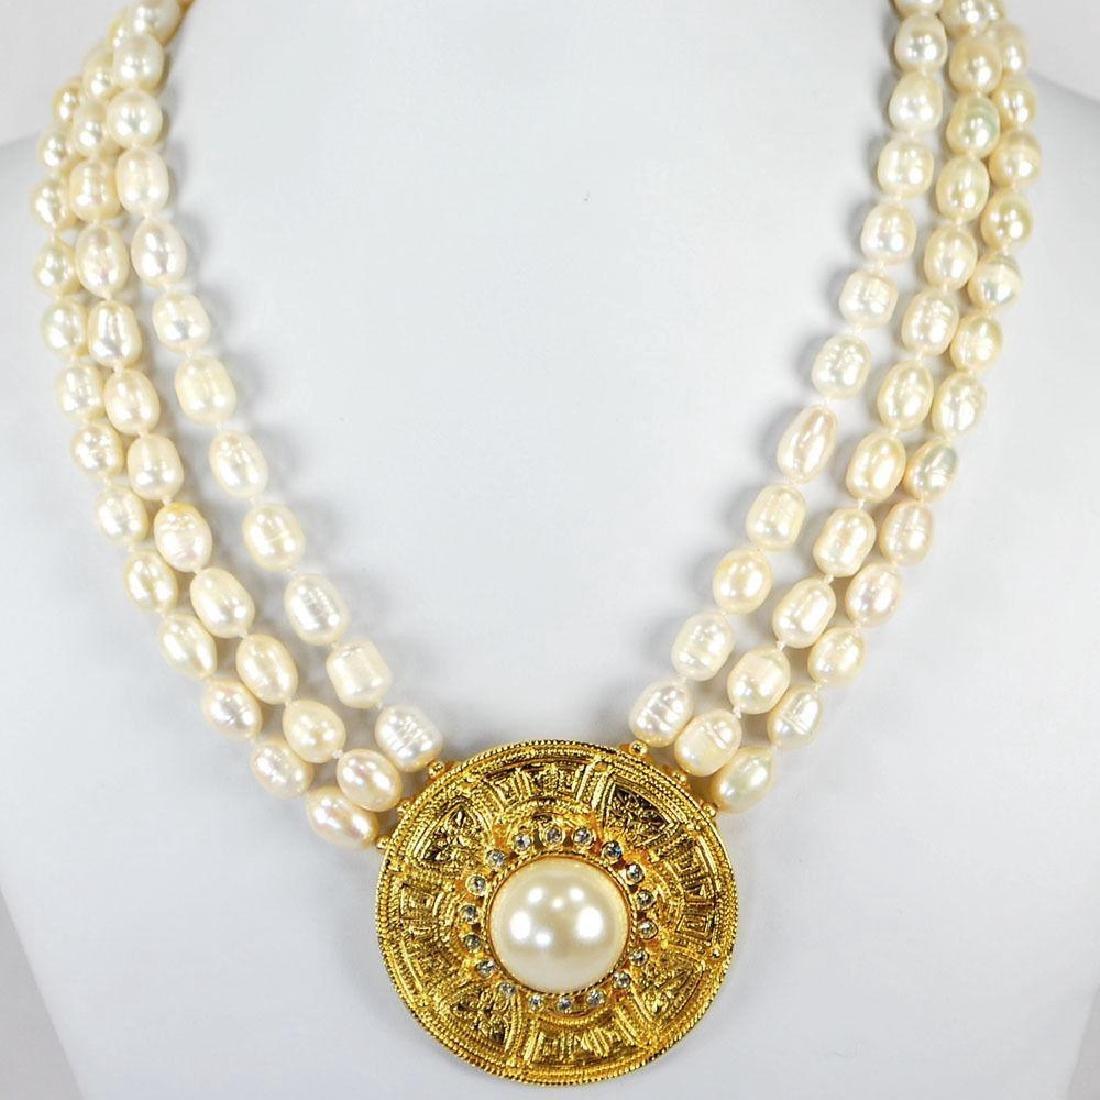 Strand Natural Freshwater Pearl Pendant 14k Gold Filled